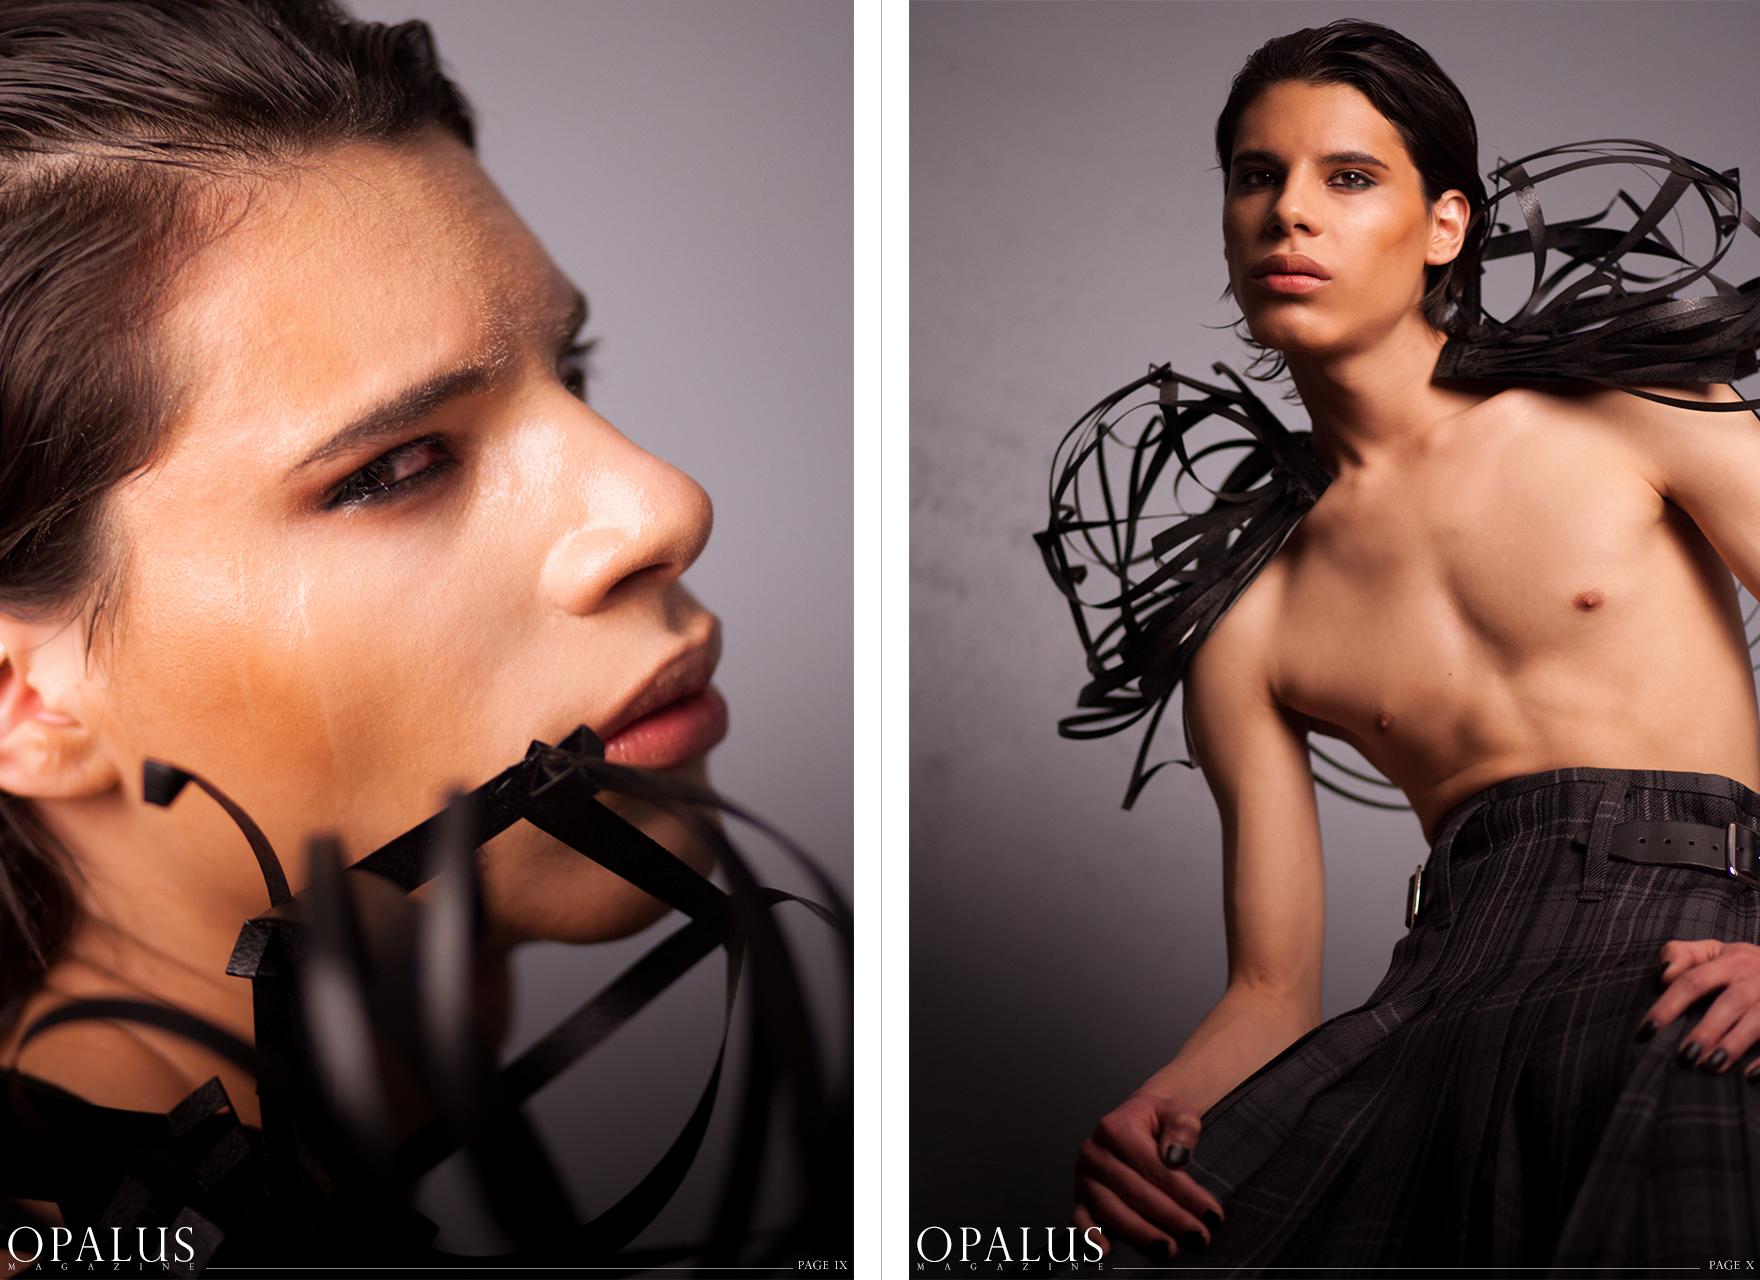 PHOTOGRAPHER - MALORIE SHMYR MAKEUP ARTIST / HAIR STYLIST - KRYSTLE ASH HEADDRESS / SHOULDER PIECE  - MALORIE SHMYR CLOTHING - SCOTTISH IMPORTS - WWW.ANYTHINGSCHOTTISH.COM MODEL - STEPHAN